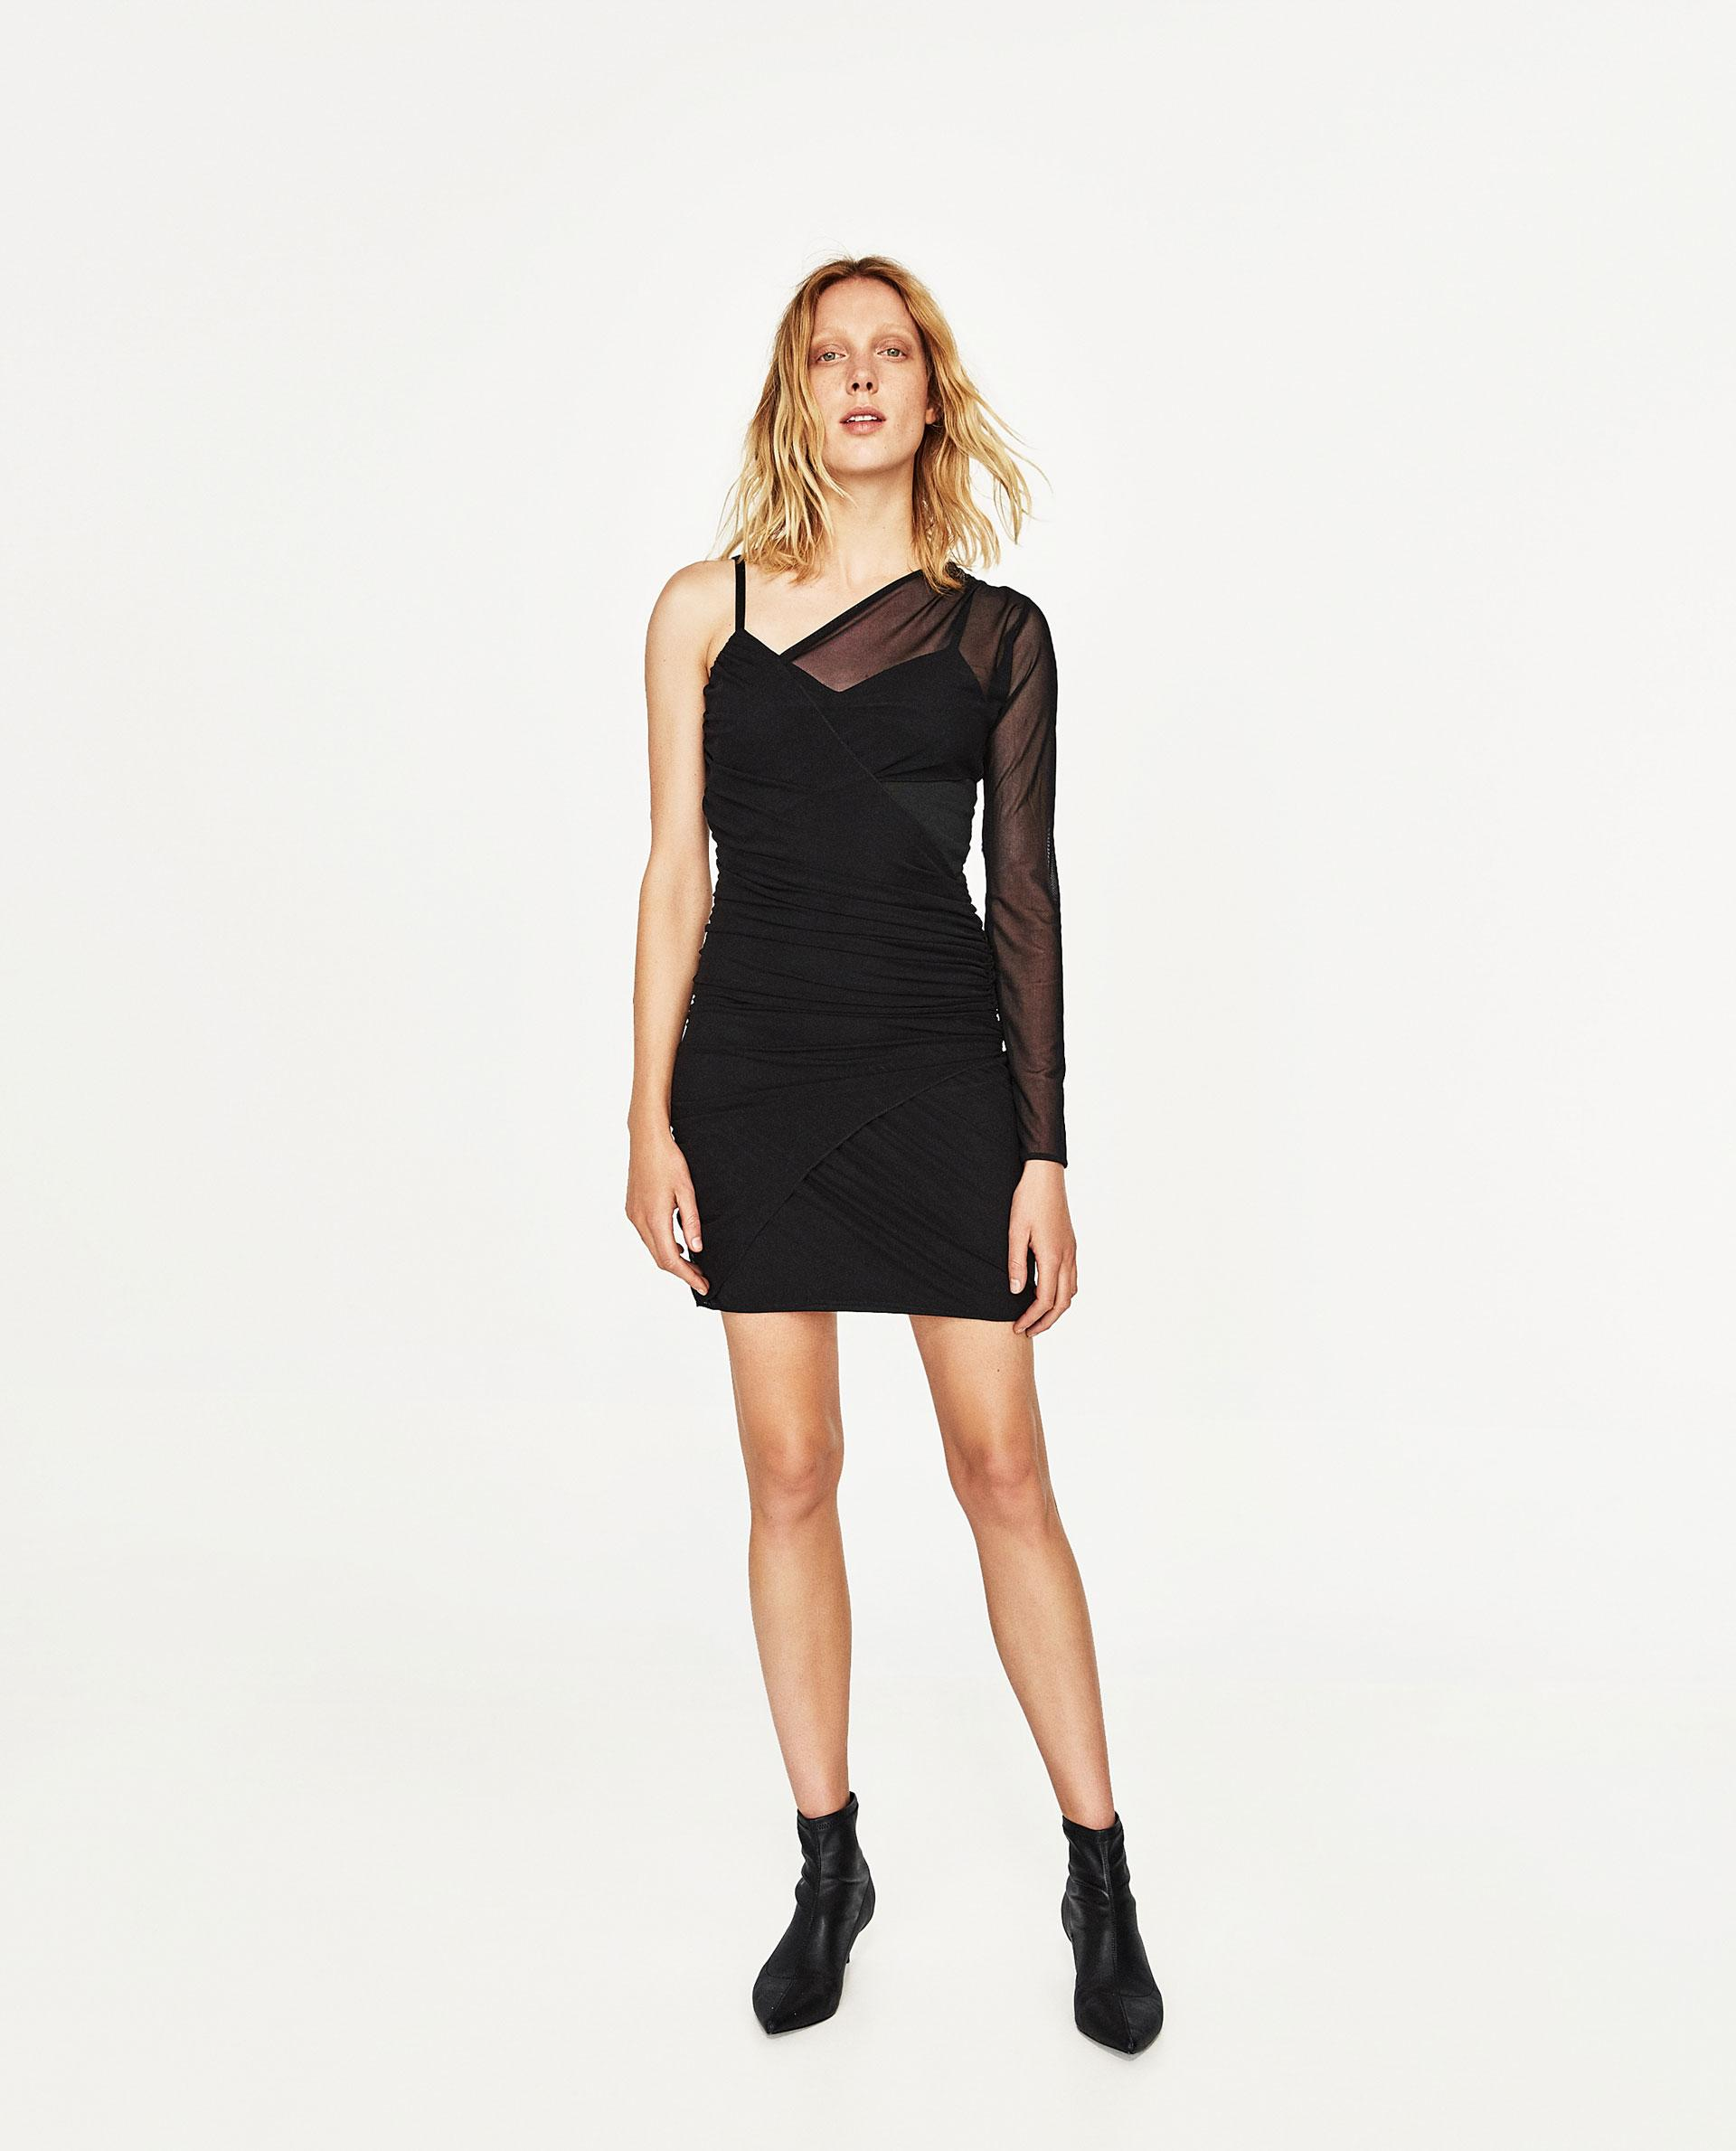 Zara Dress With Tulle Sleeve in Black